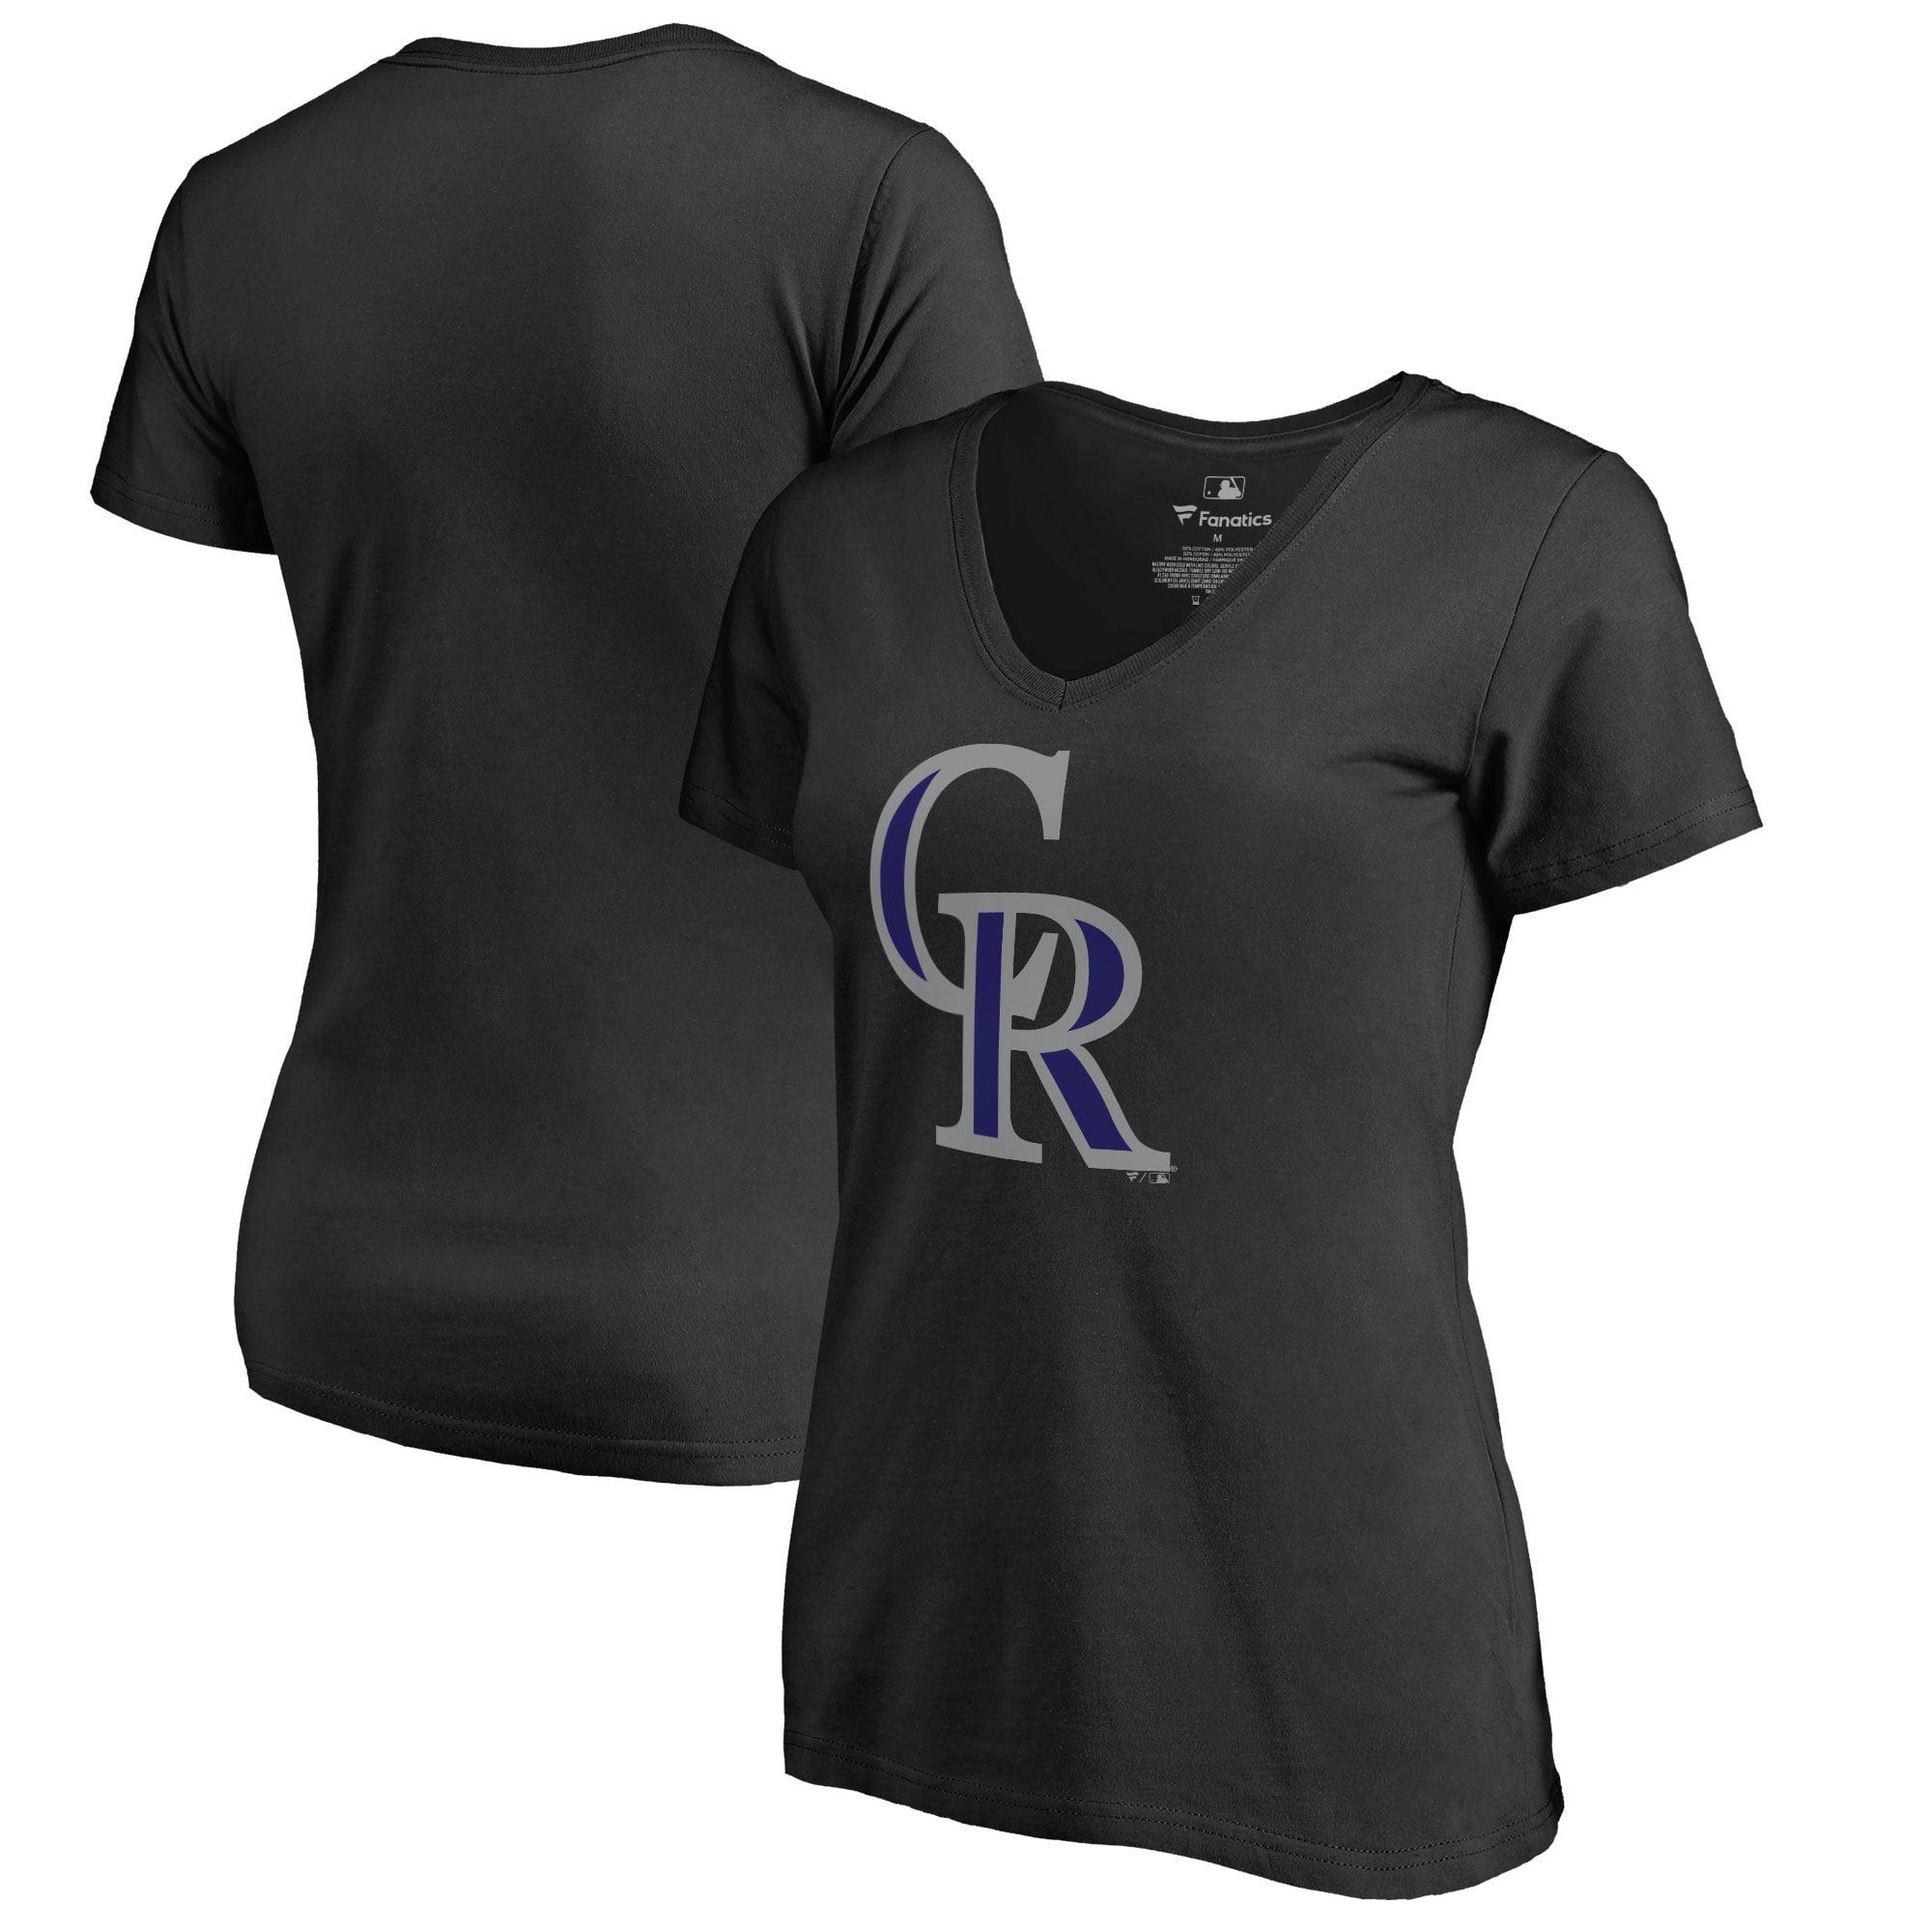 Colorado Rockies Women's Plus Sizes Primary Team Logo T-Shirt - Black